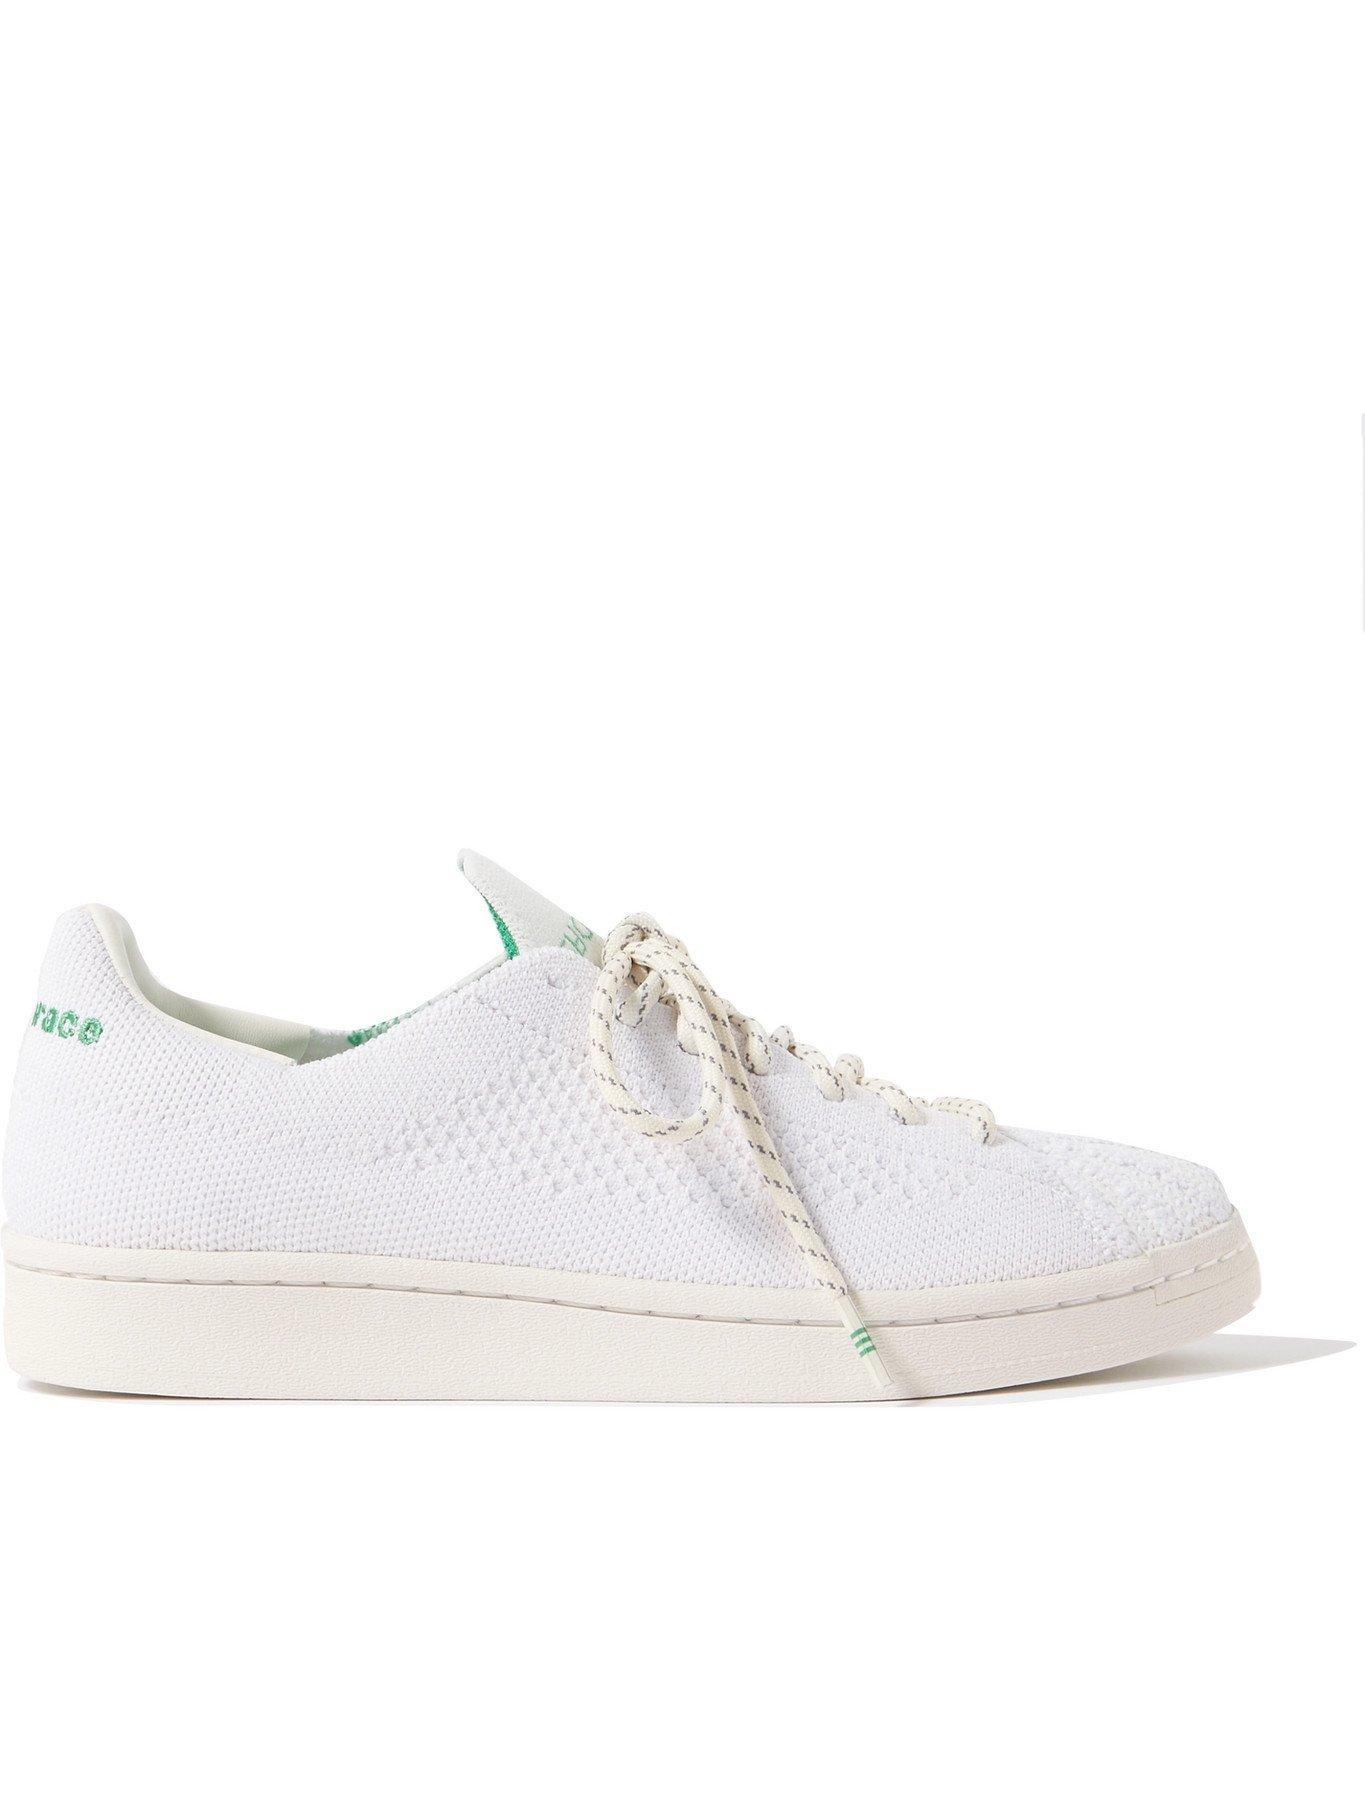 Photo: ADIDAS ORIGINALS - Pharrell Williams Superstar Primeknit Sneakers - White - UK 4.5